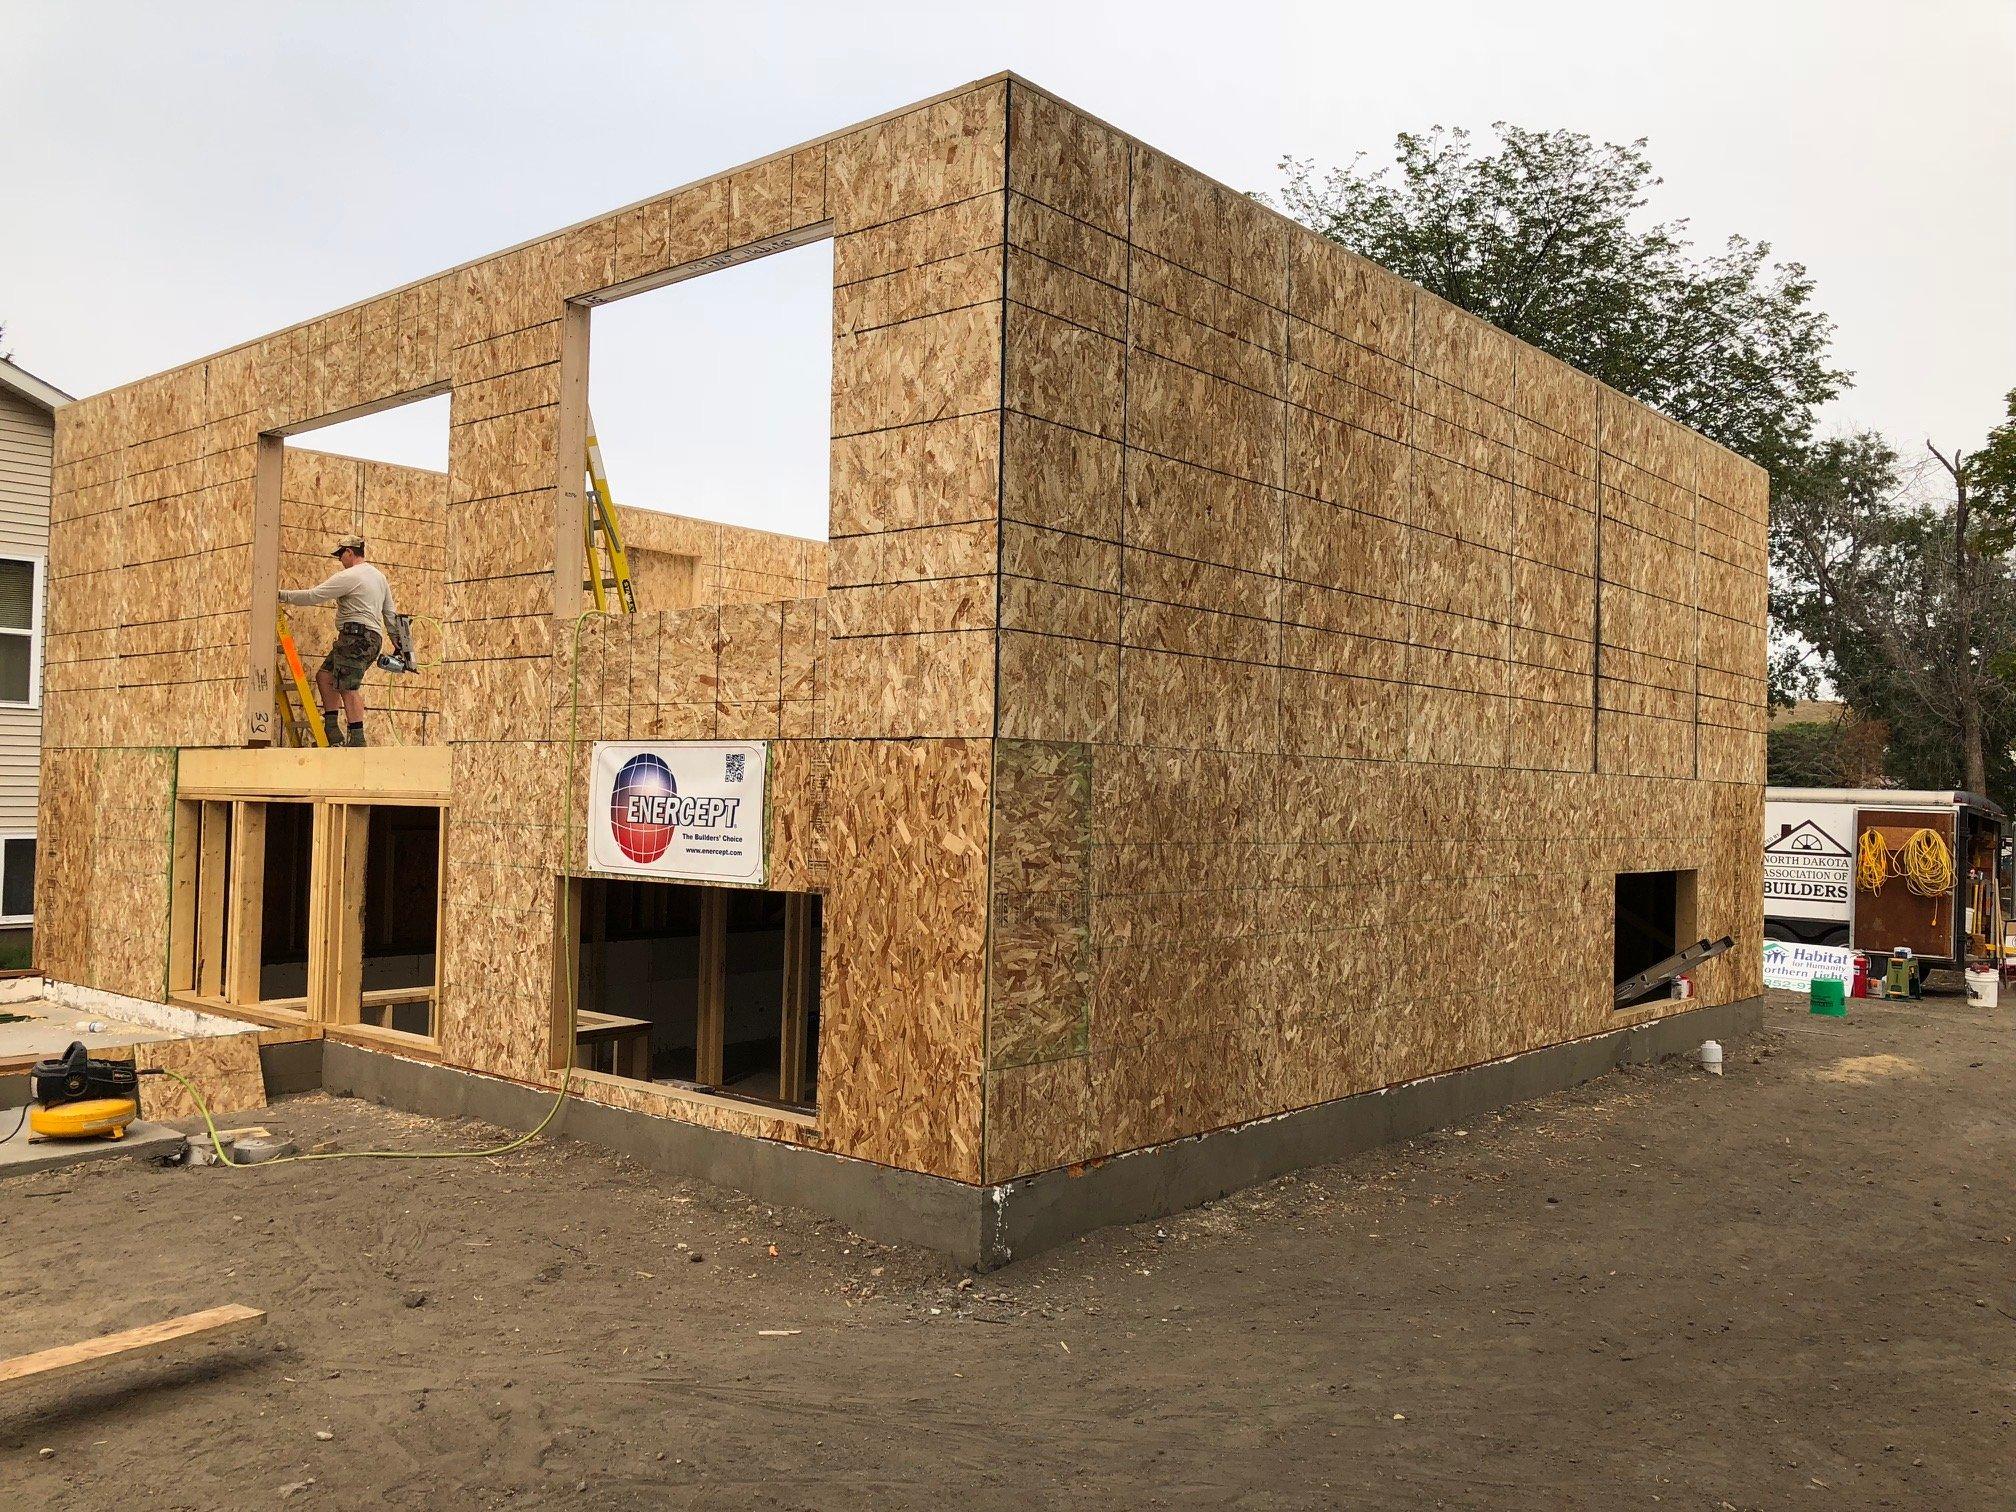 Habitat house Minot, ND